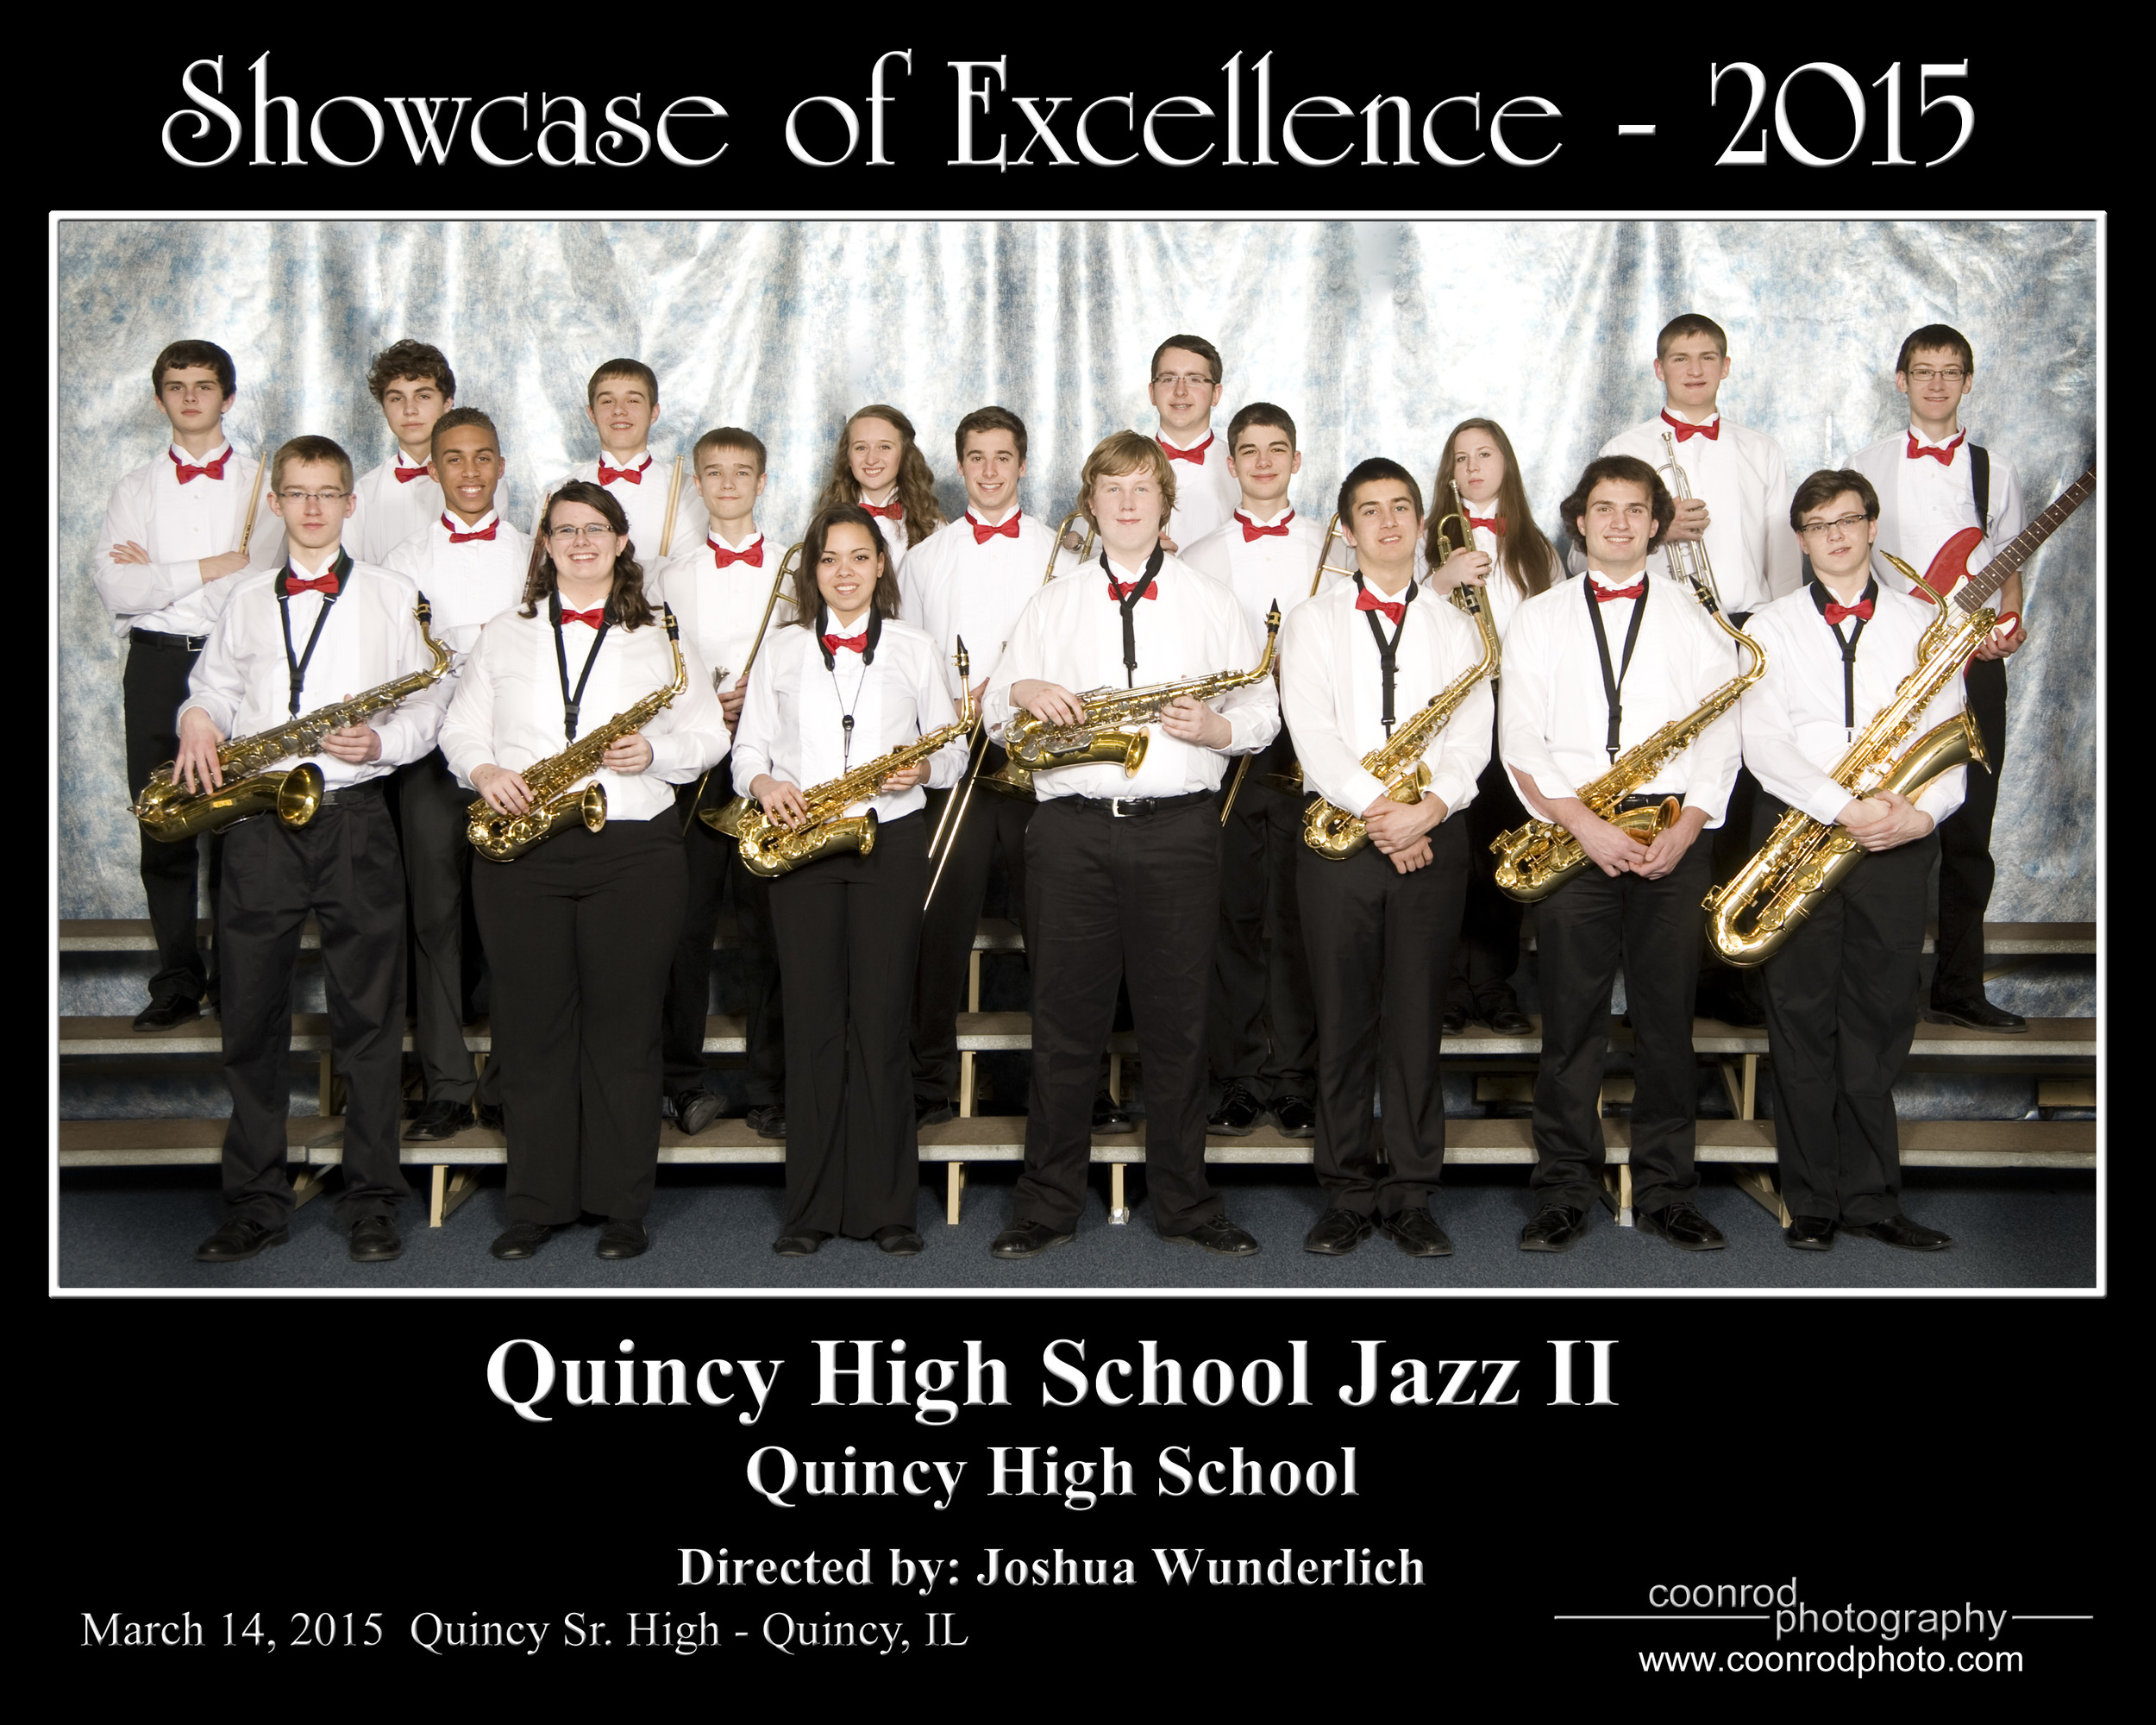 01 QHS Jazz II.jpg